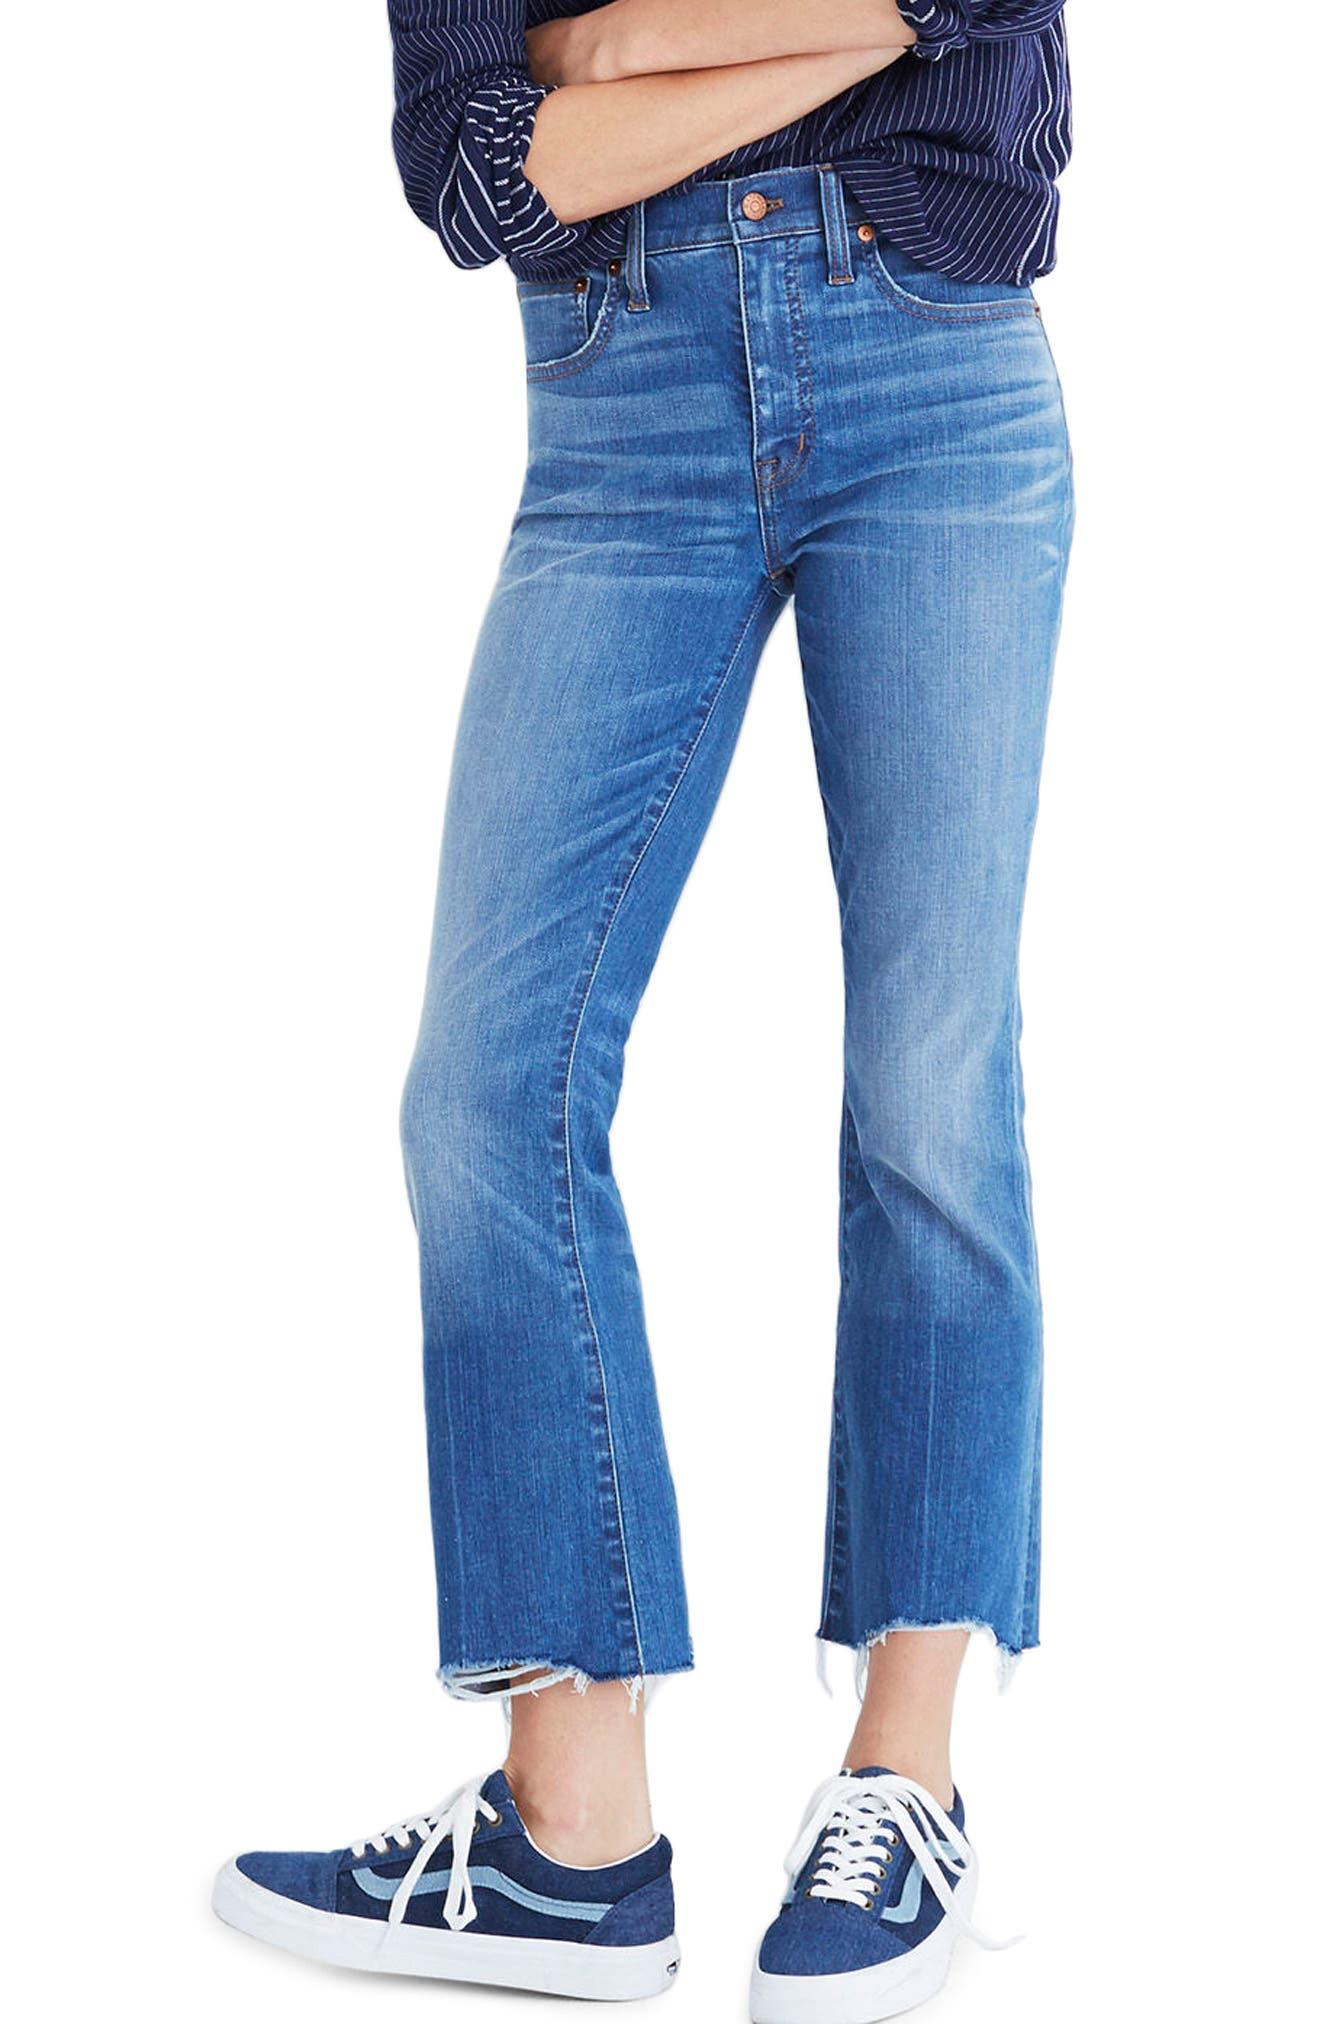 Madewell Cali Demi Boot Jeans (Haywood Wash)